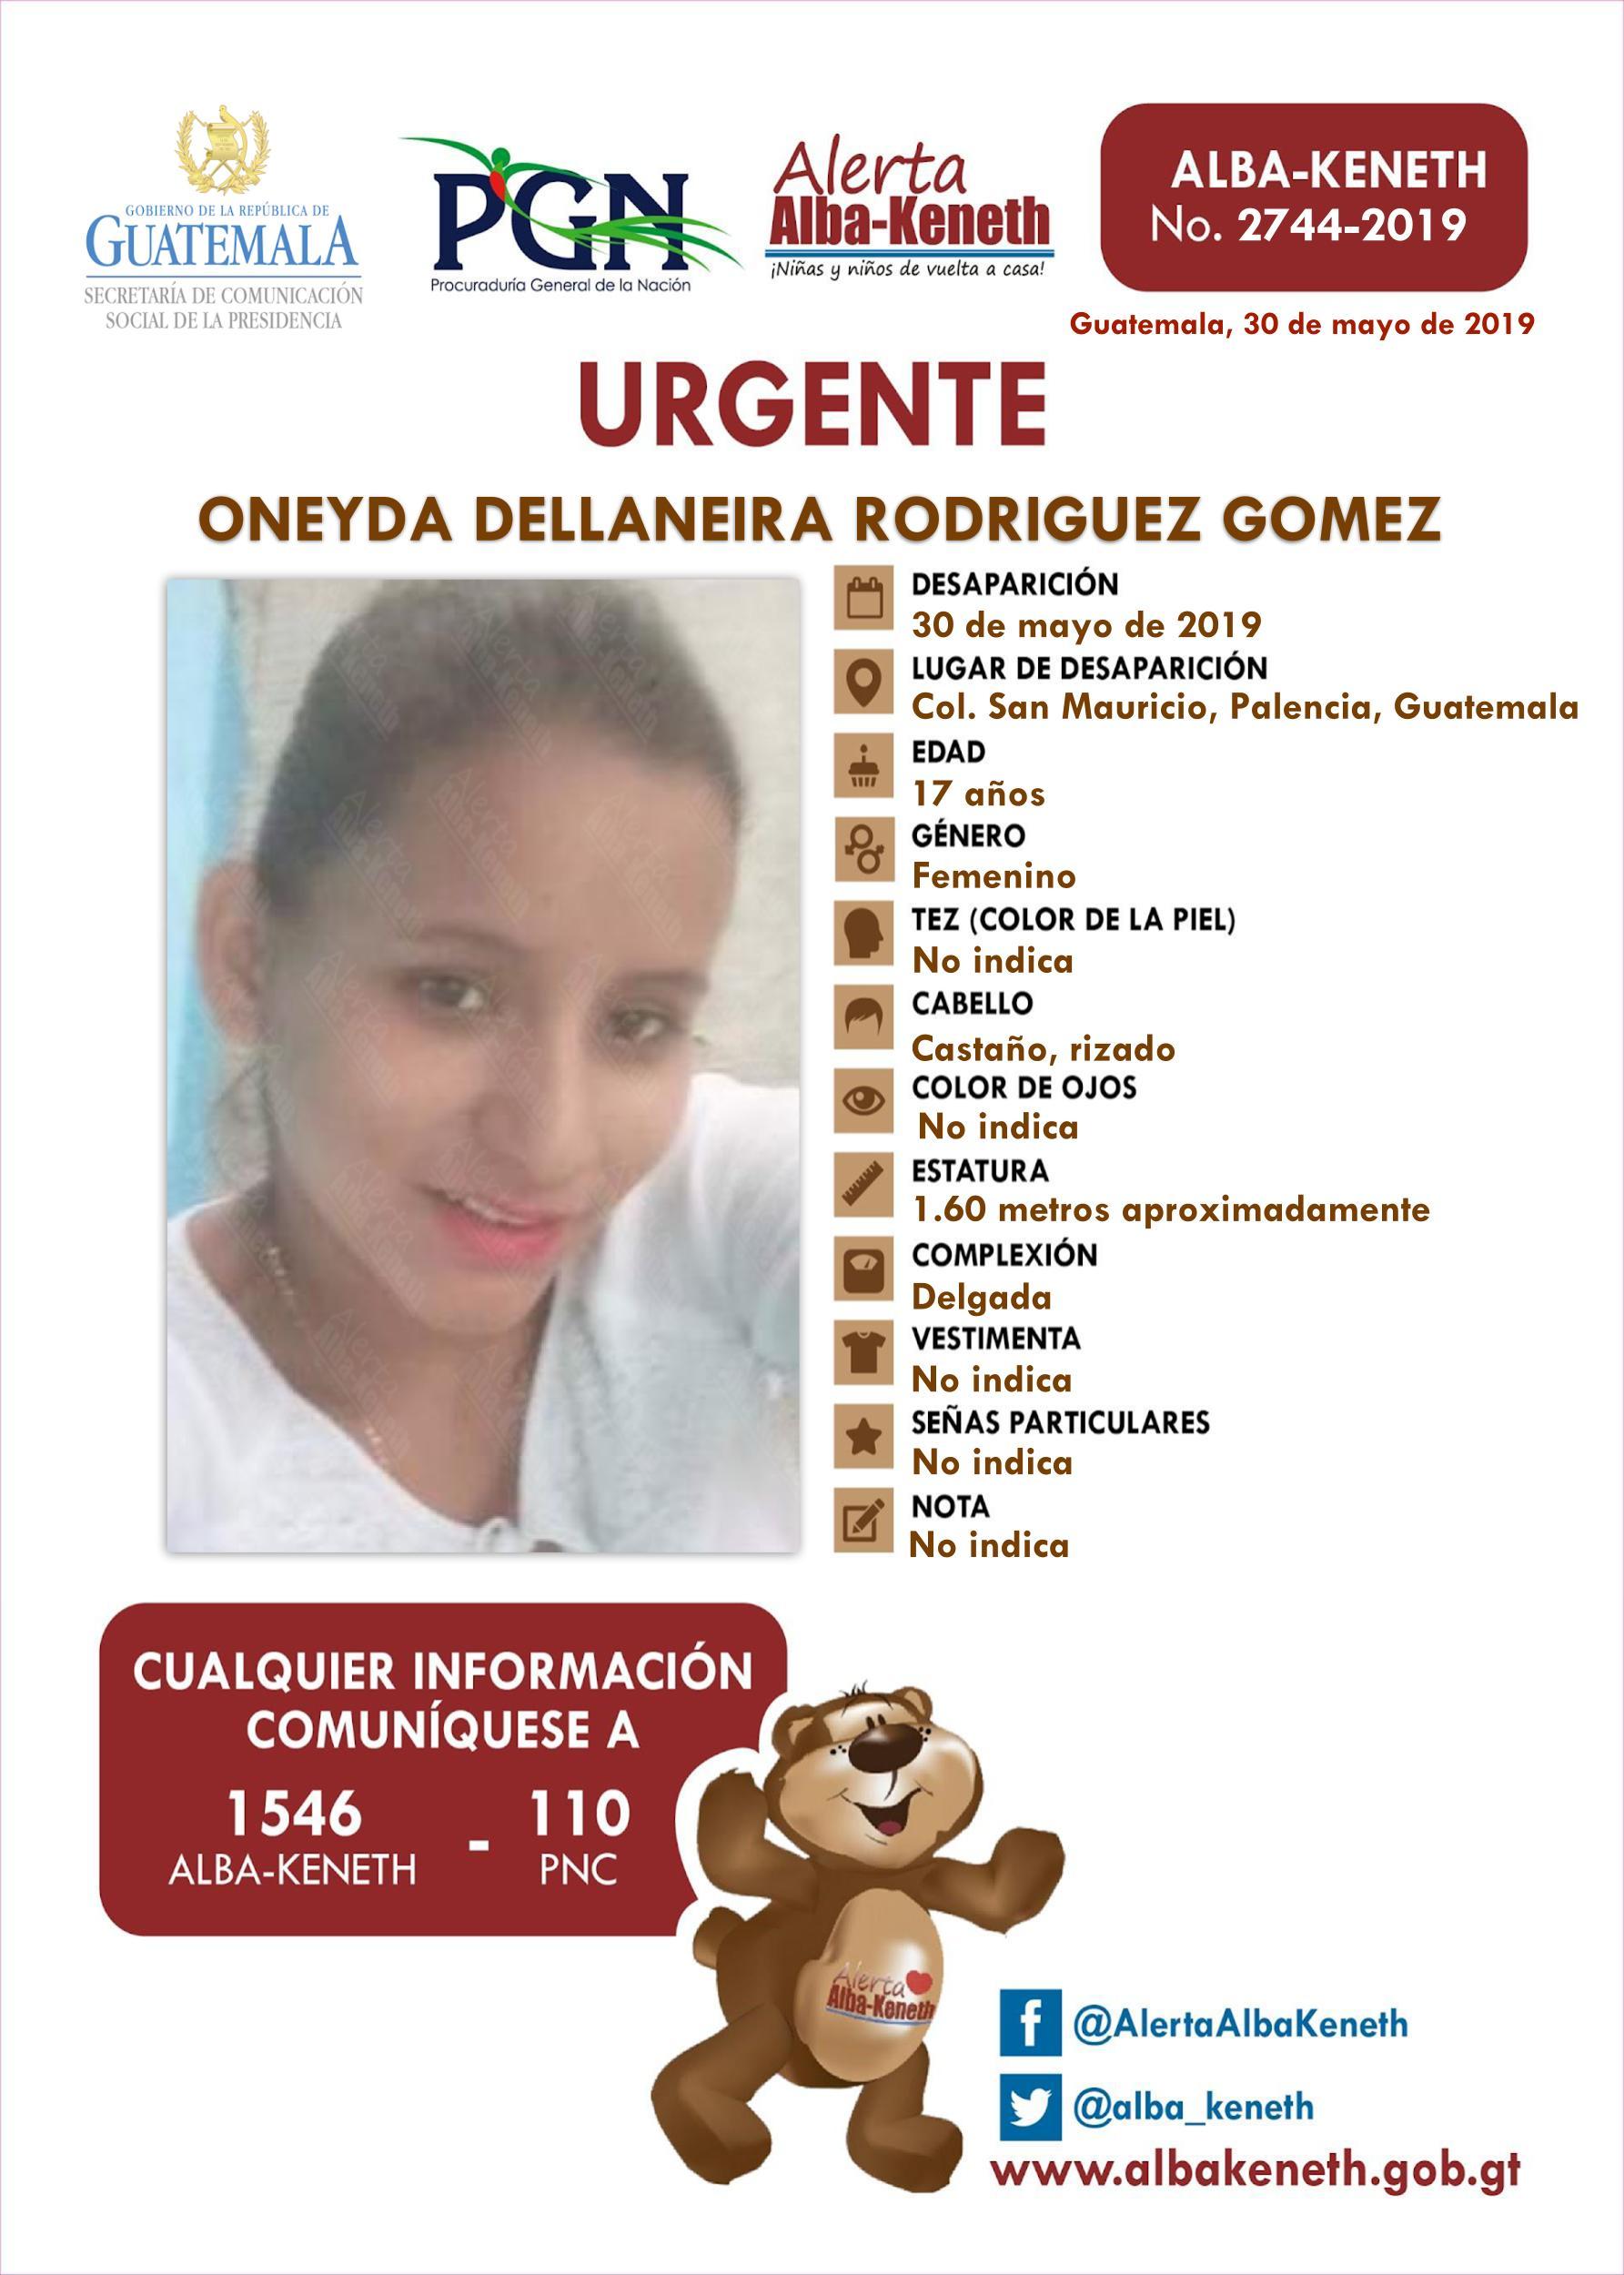 Oneyda Dellaneira Rodriguez Gomez